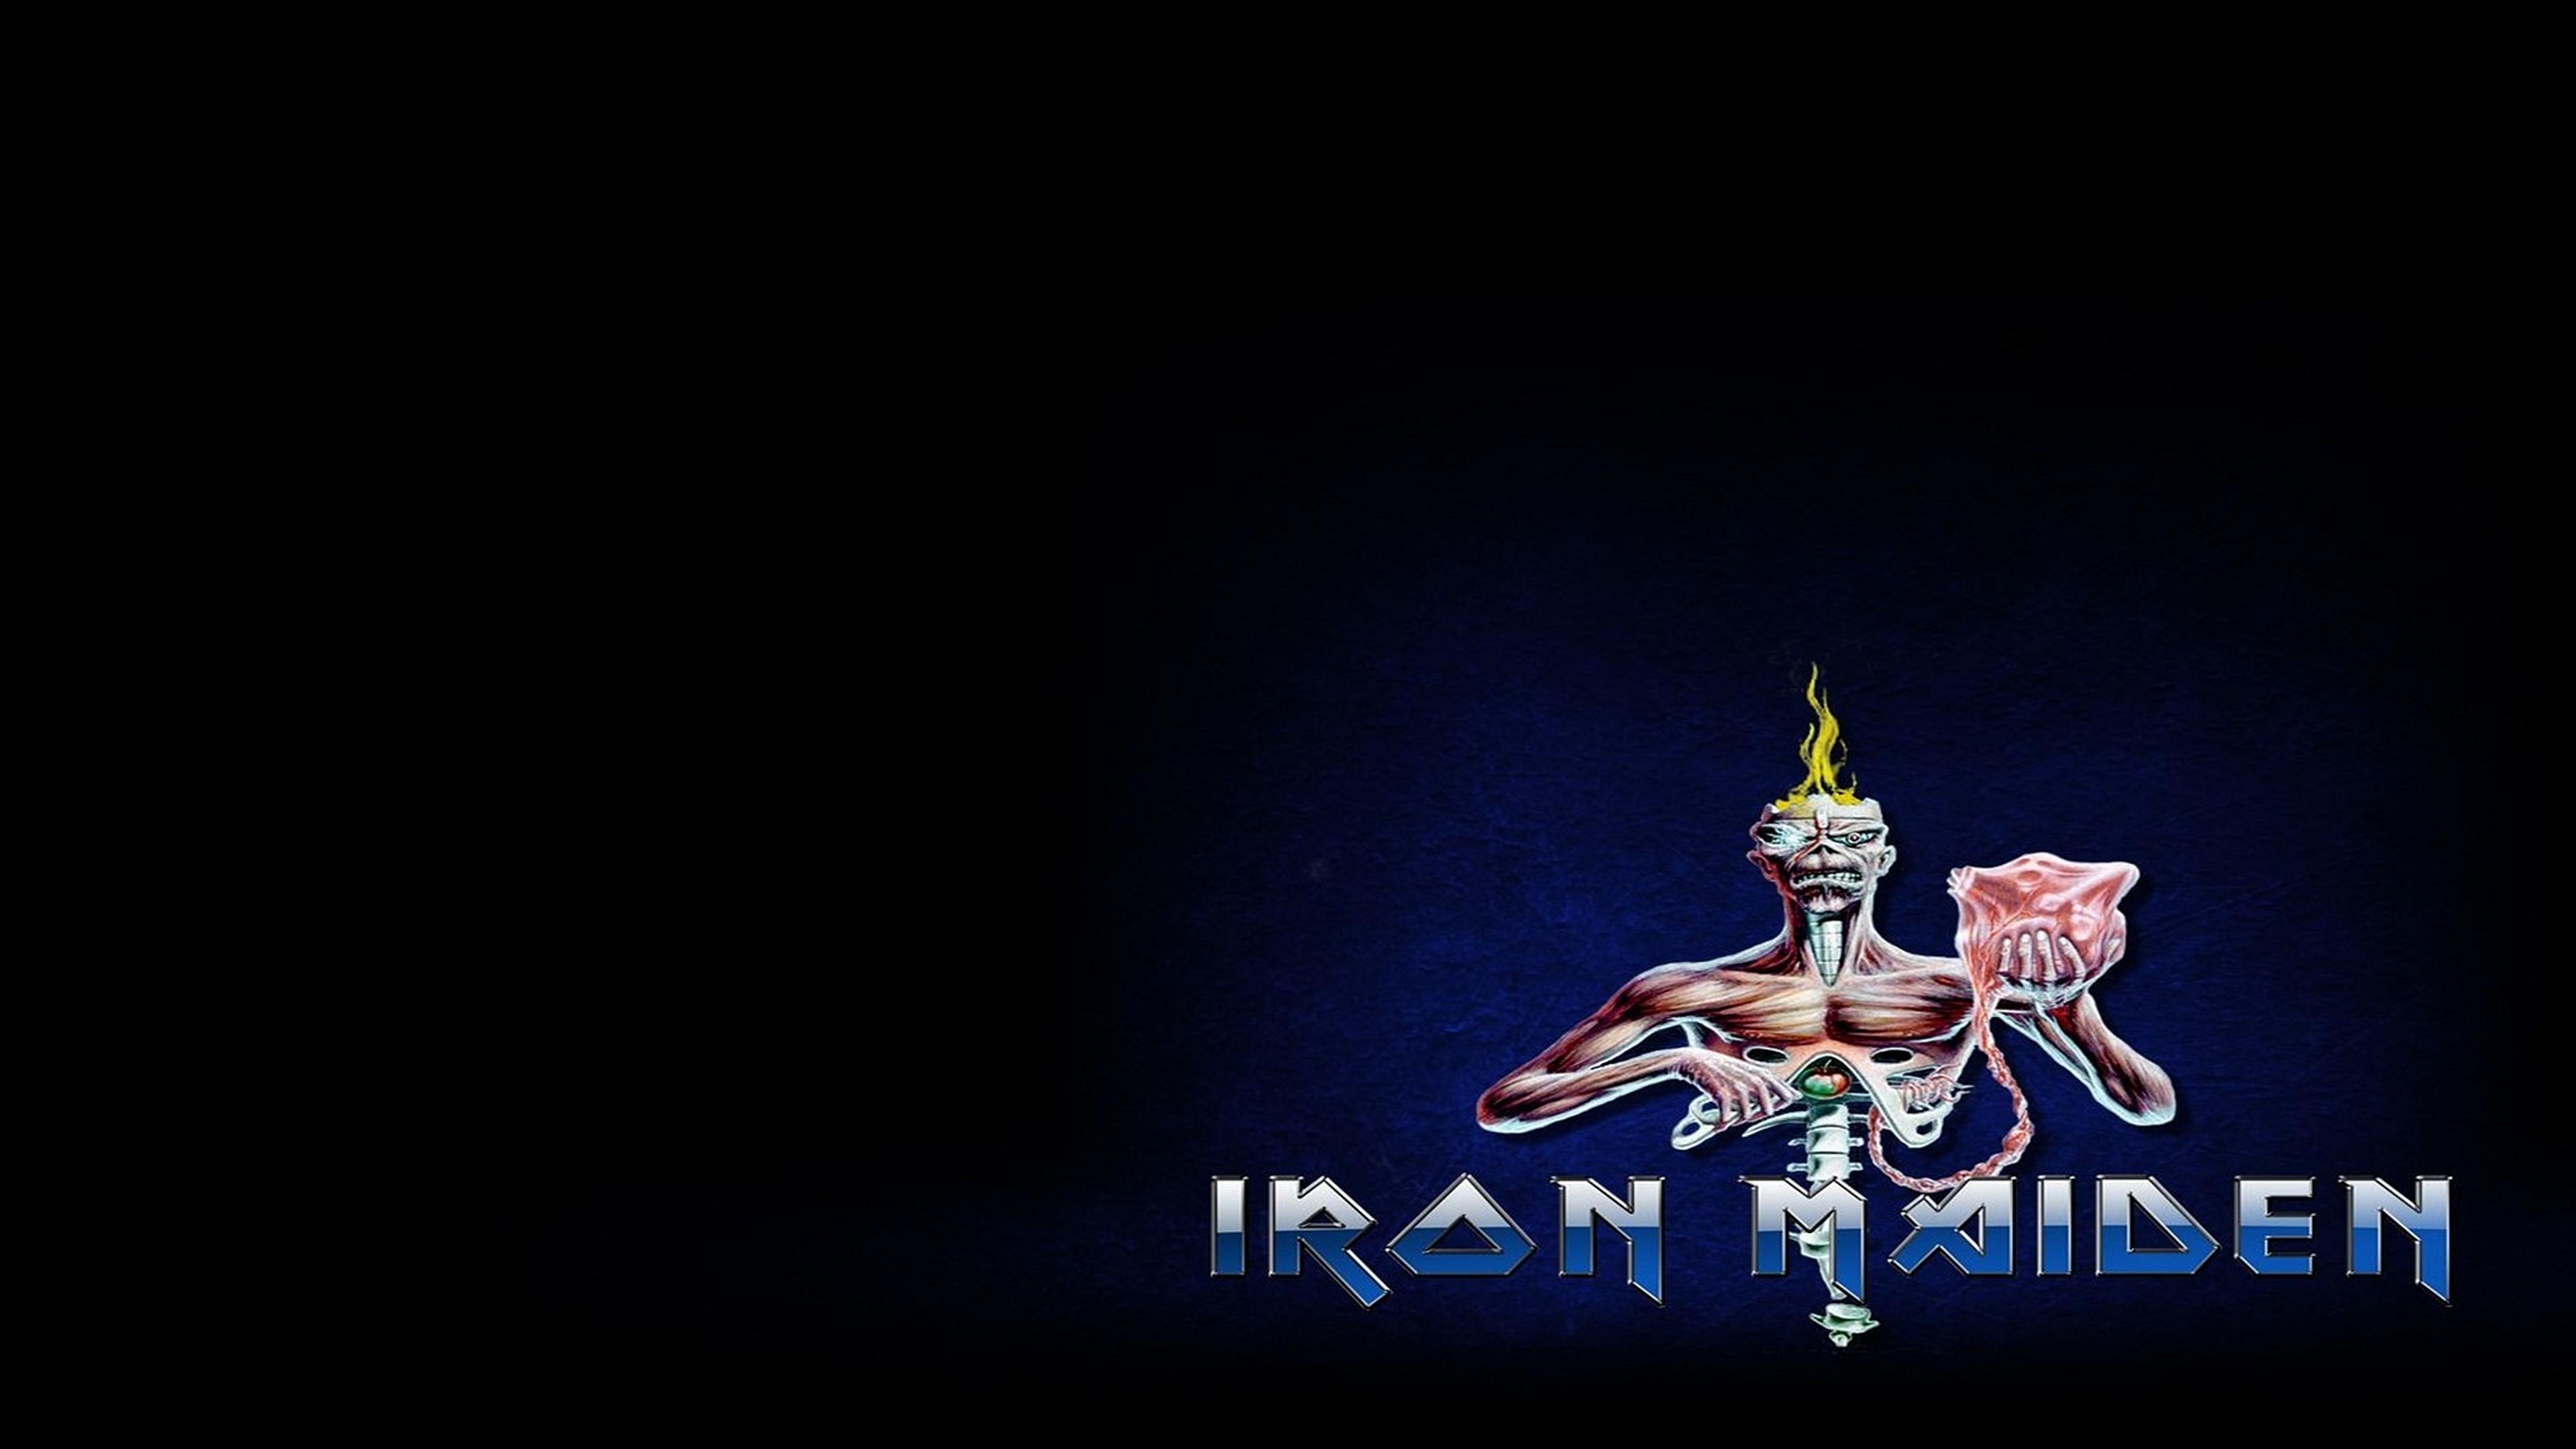 Iron Maiden Desktop Wallpaper: Iron Maiden Mobile Wallpaper